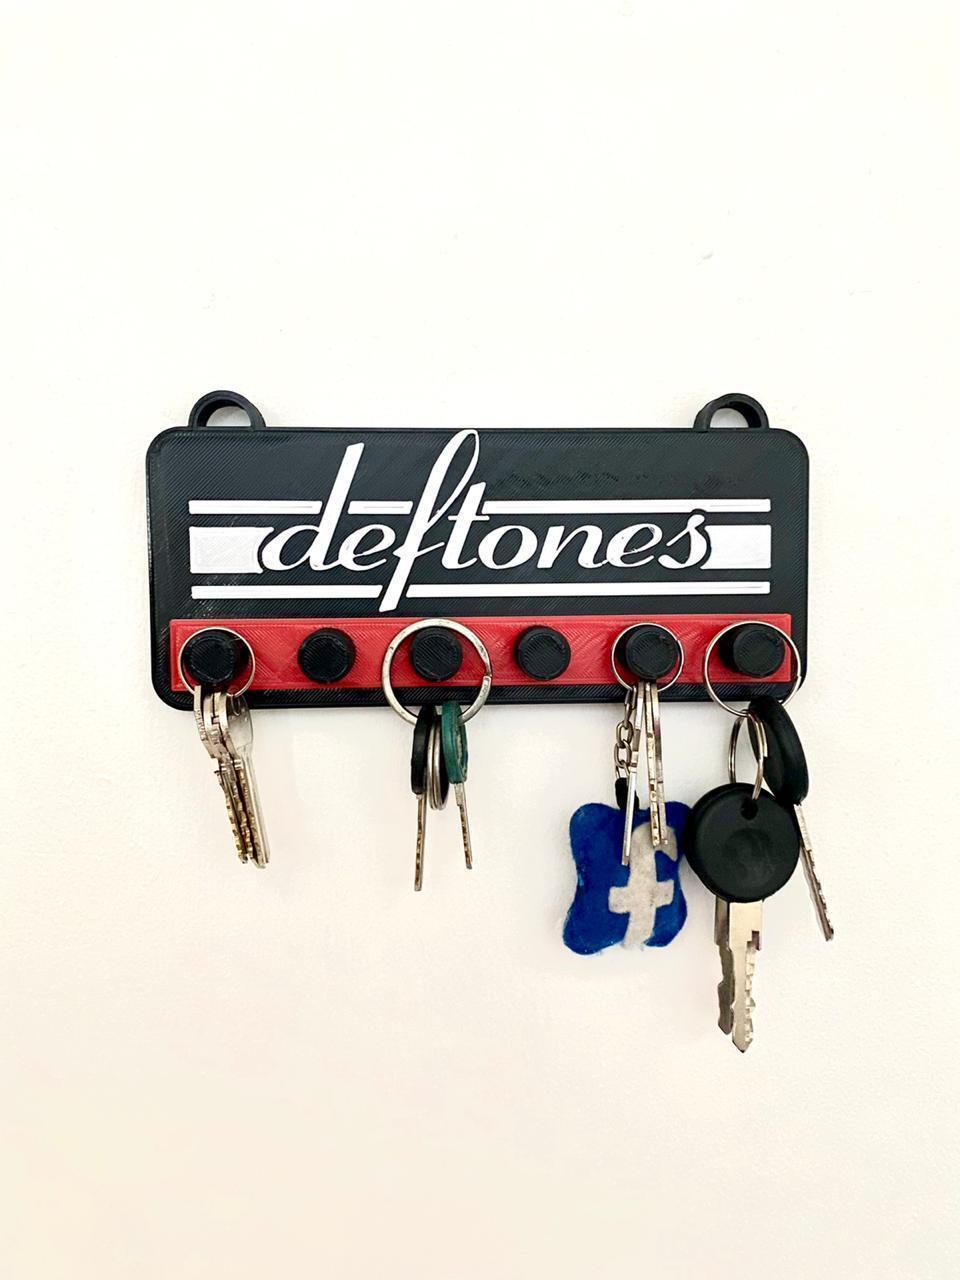 645c77ef-06be-4e8f-bb62-fc46ad36295a.jpg Download STL file Deftones key holder • 3D print object, impresiones_bb_3d